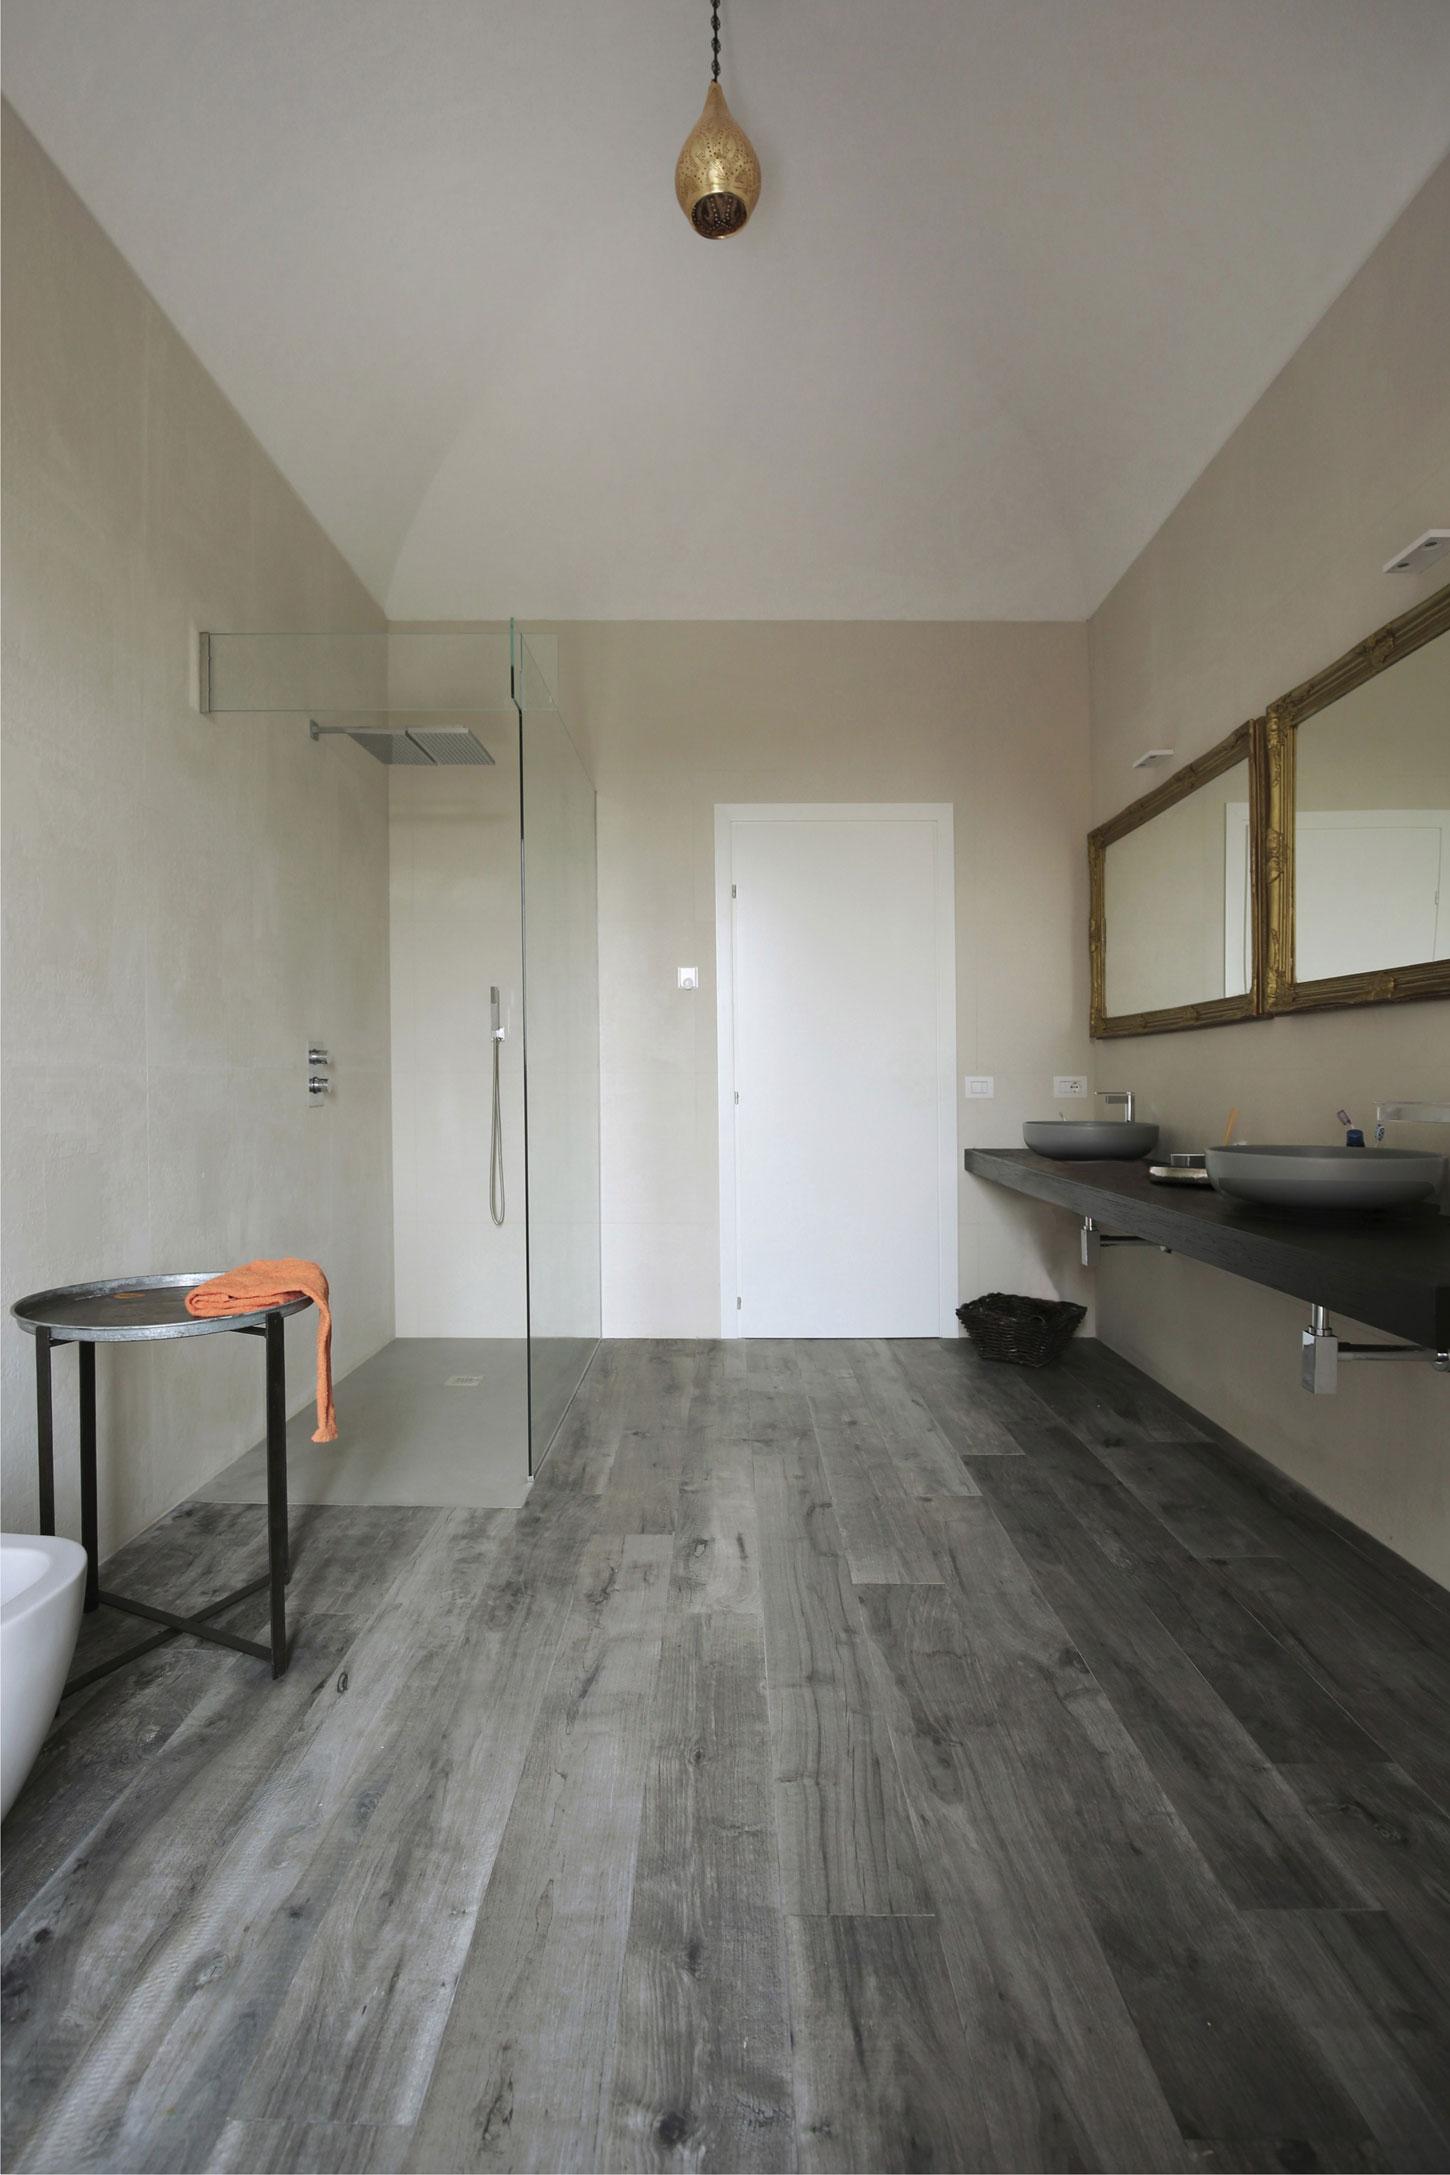 CRV House in Viagrande by ACA Amore Campione Architettura-25